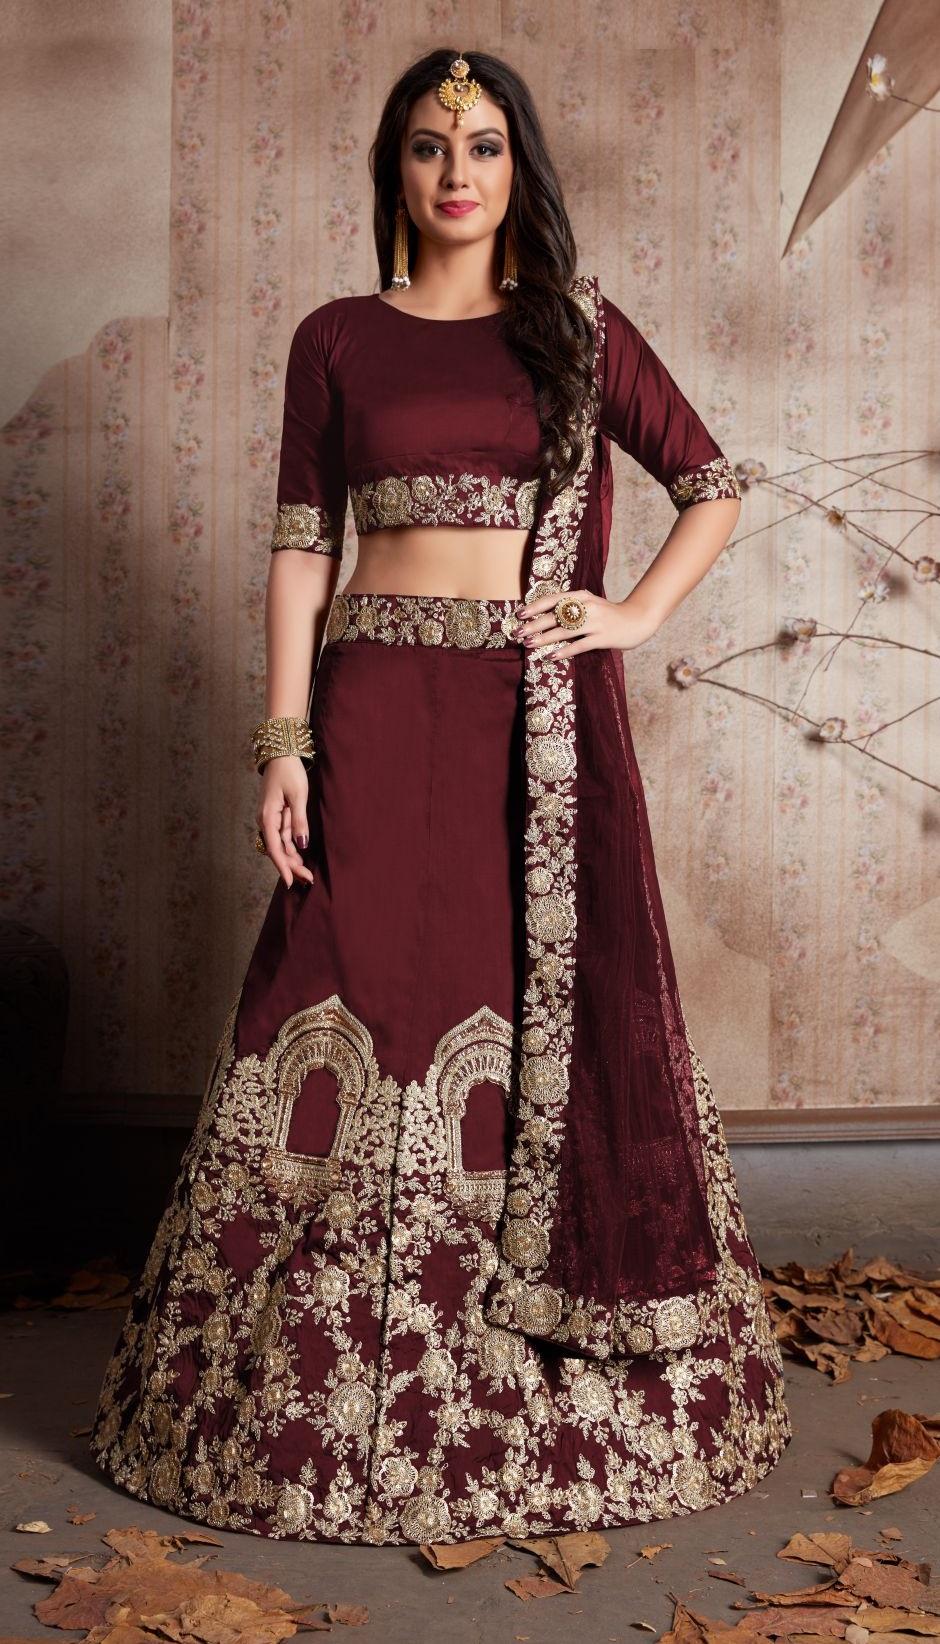 4b6415518e31 Indian Dress Brown Color Bridal Lehenga 529